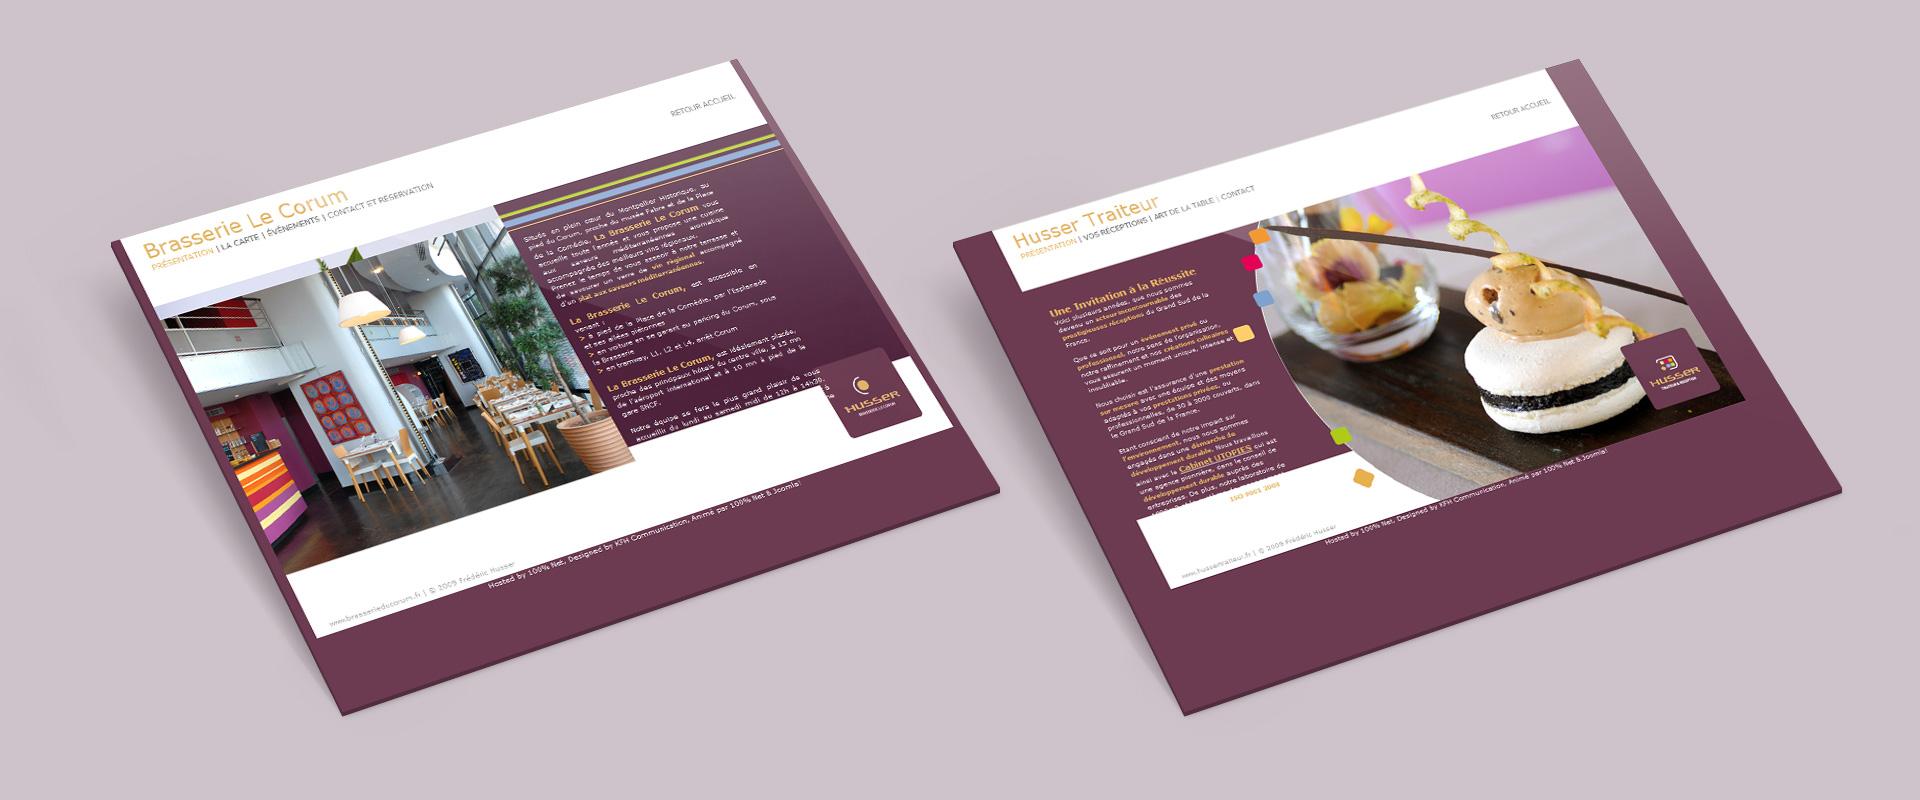 Sites web Brasserie du Corum / Husser traiteur